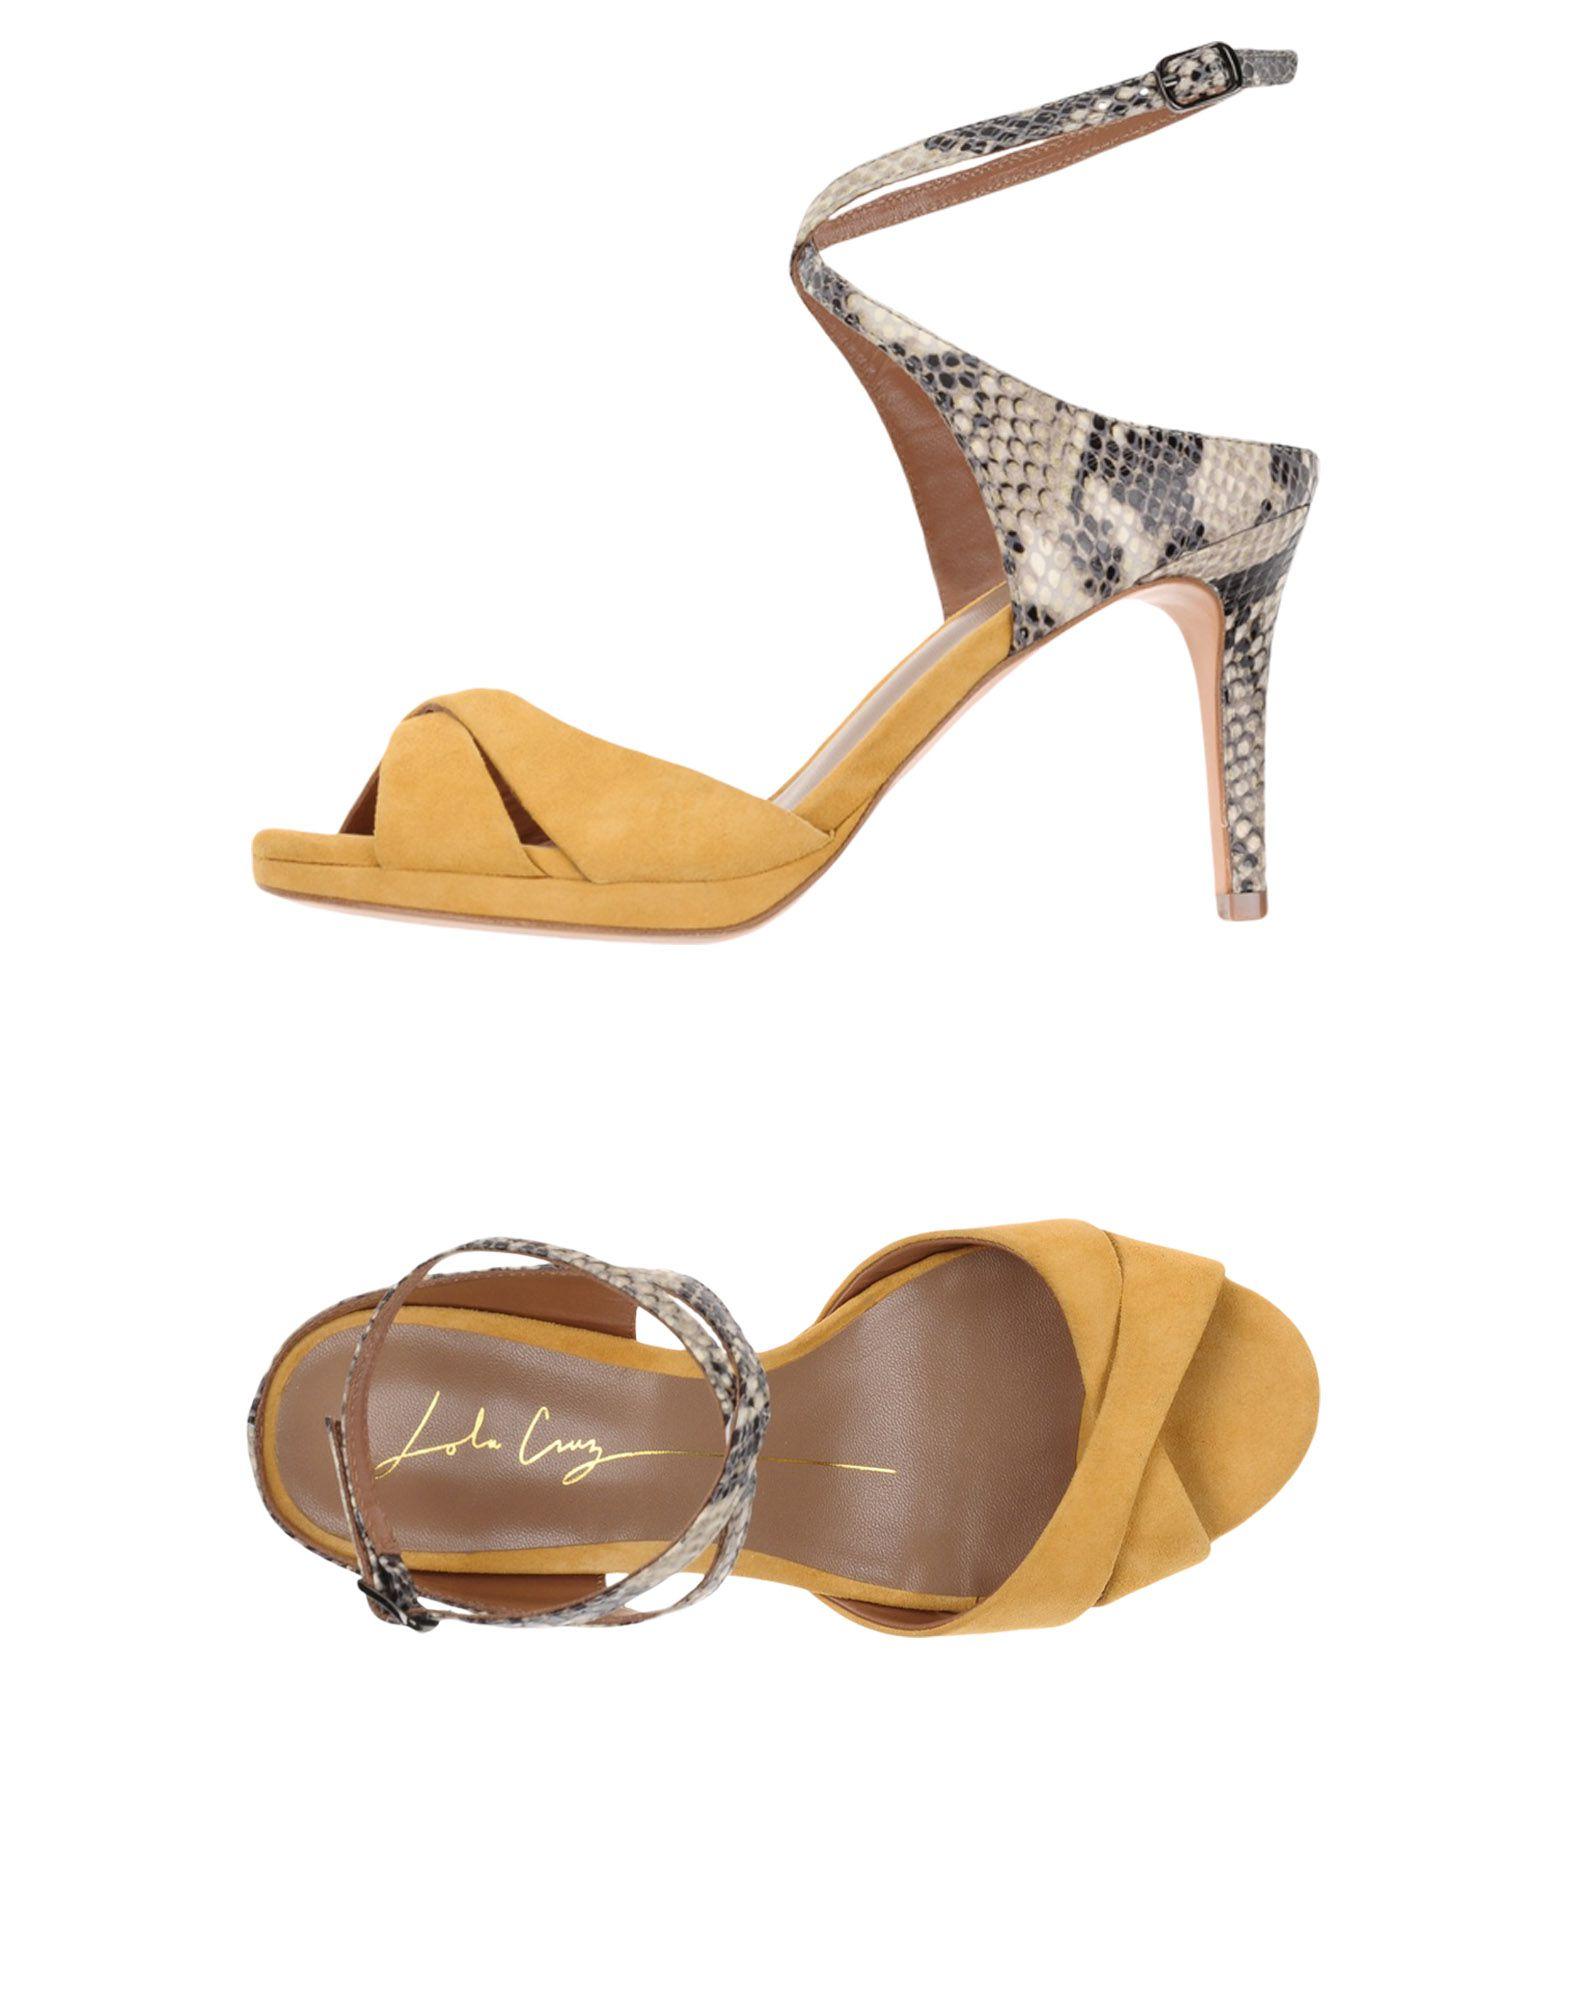 Lola Cruz Sandalen Damen  11346375KB Gute Qualität beliebte Schuhe